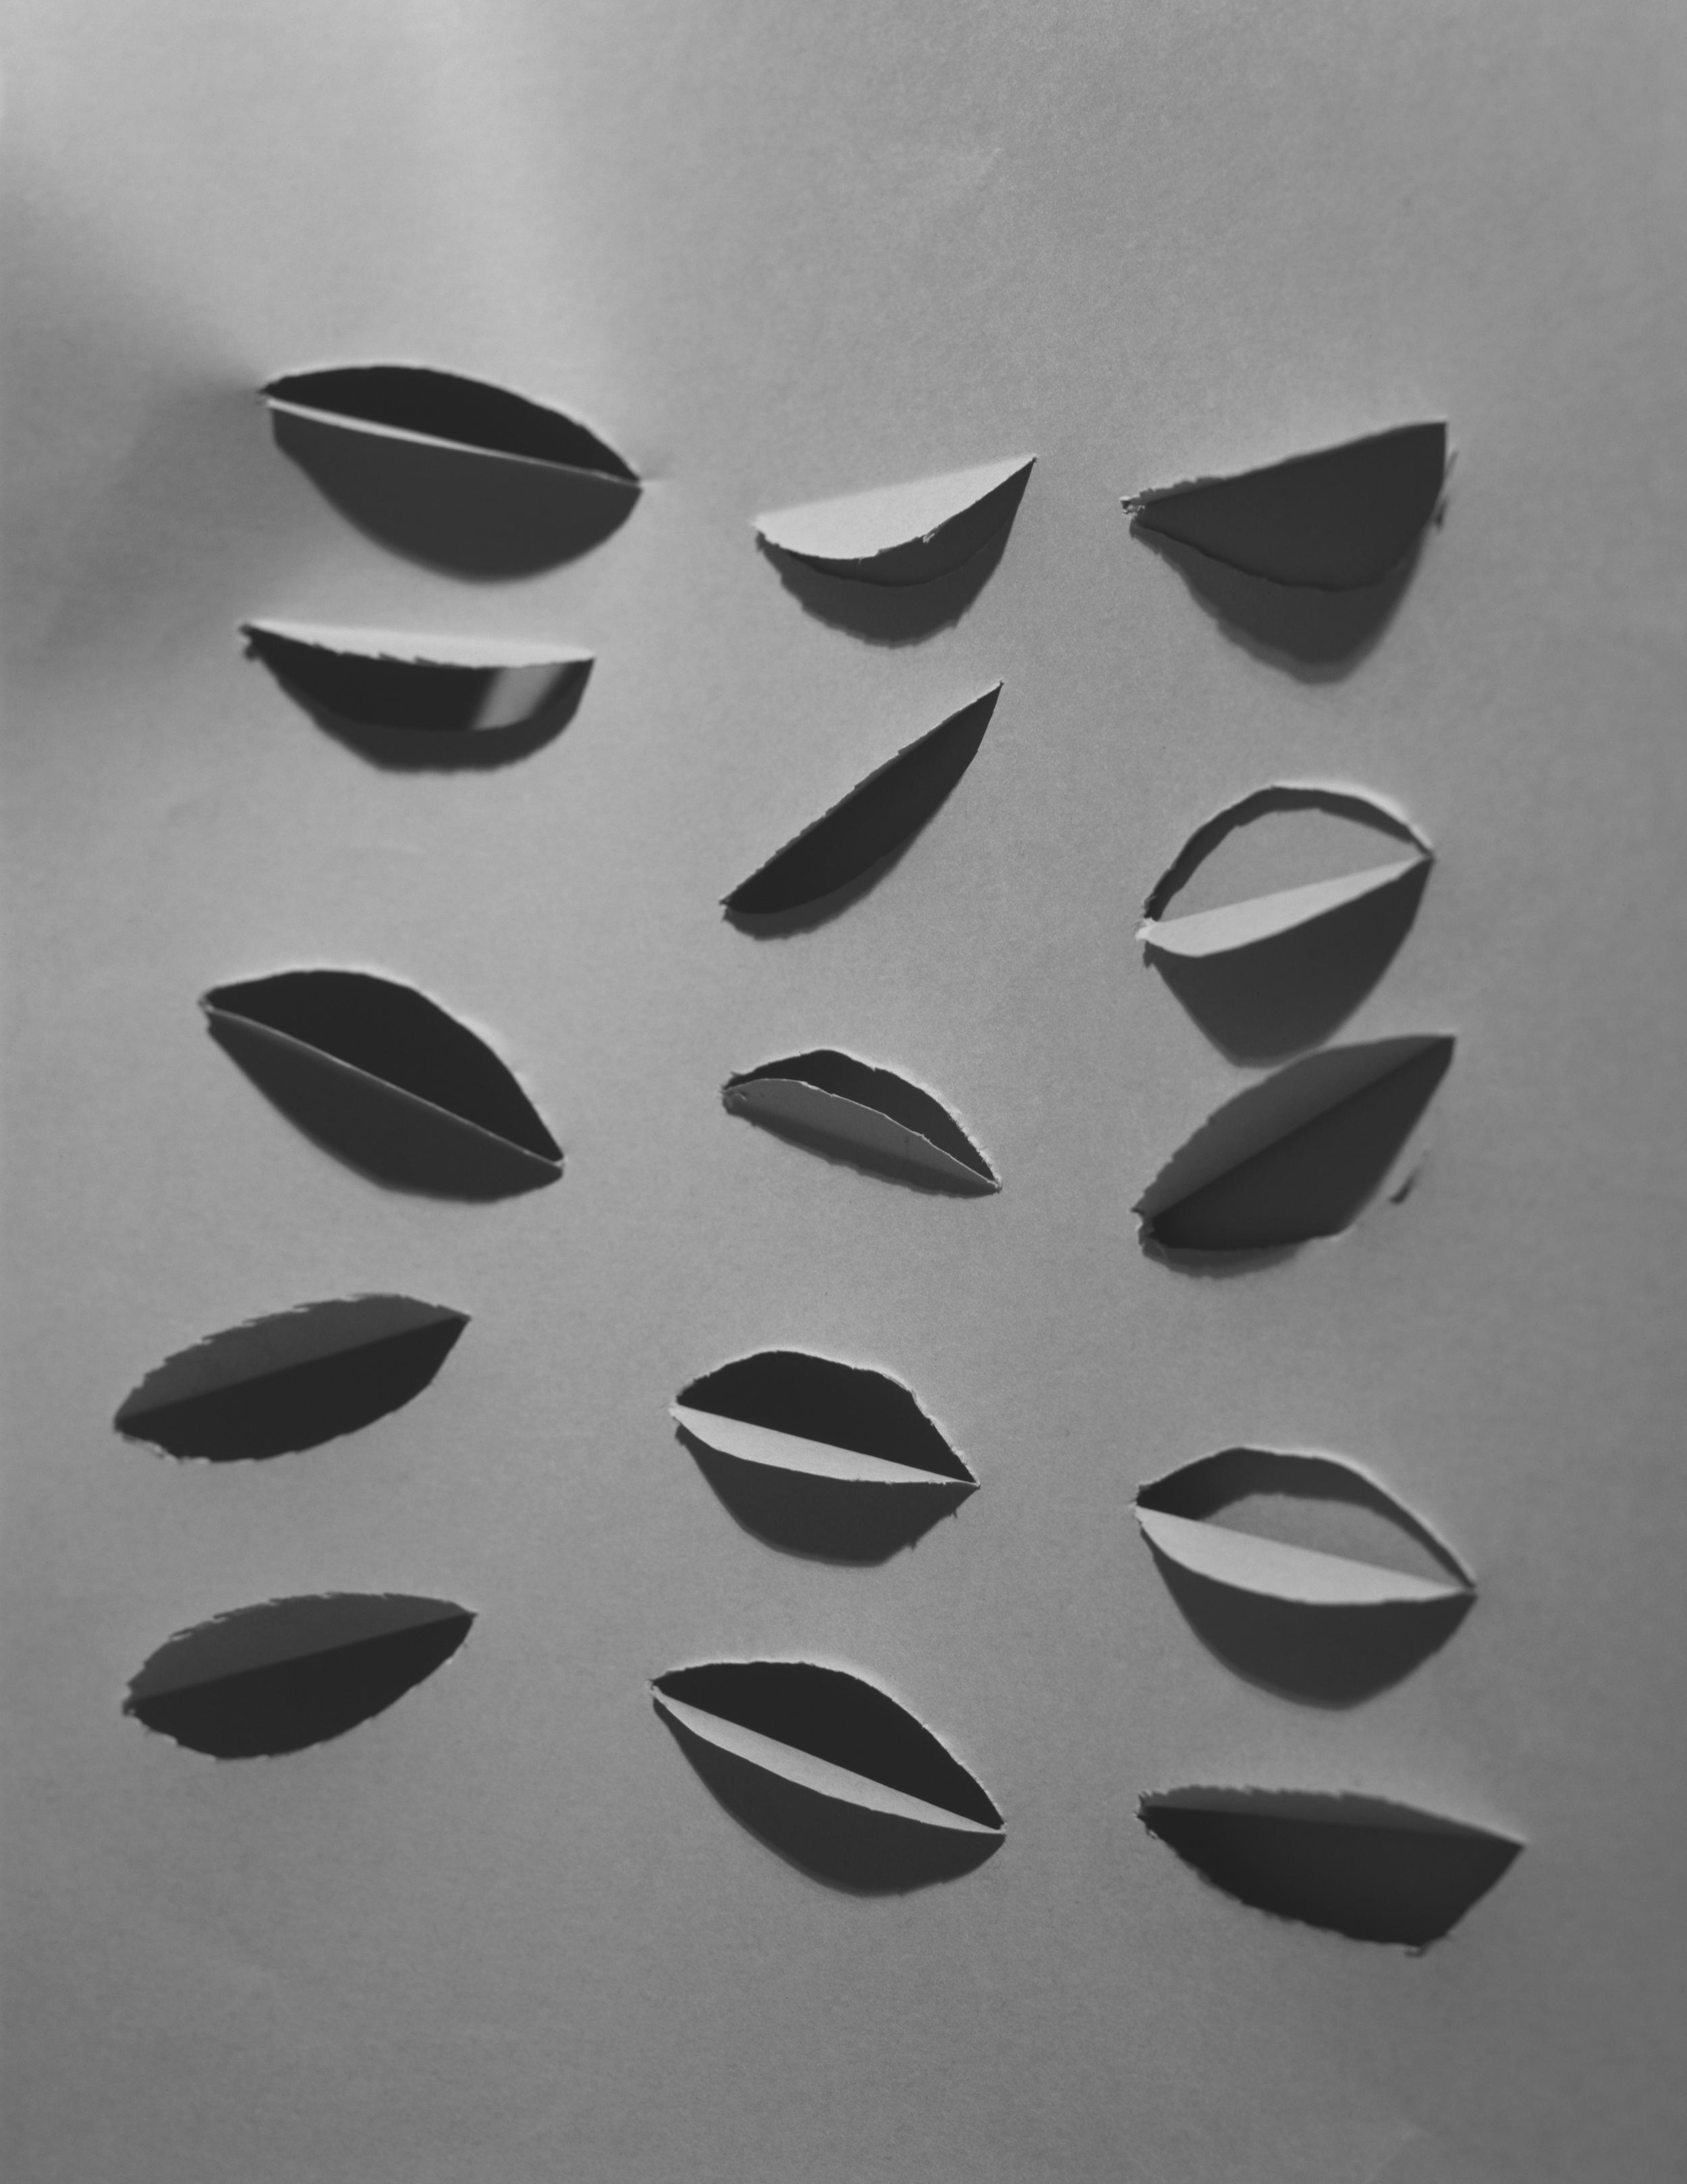 III (Cuts), C-Print, 17 x 22 inches, 2011